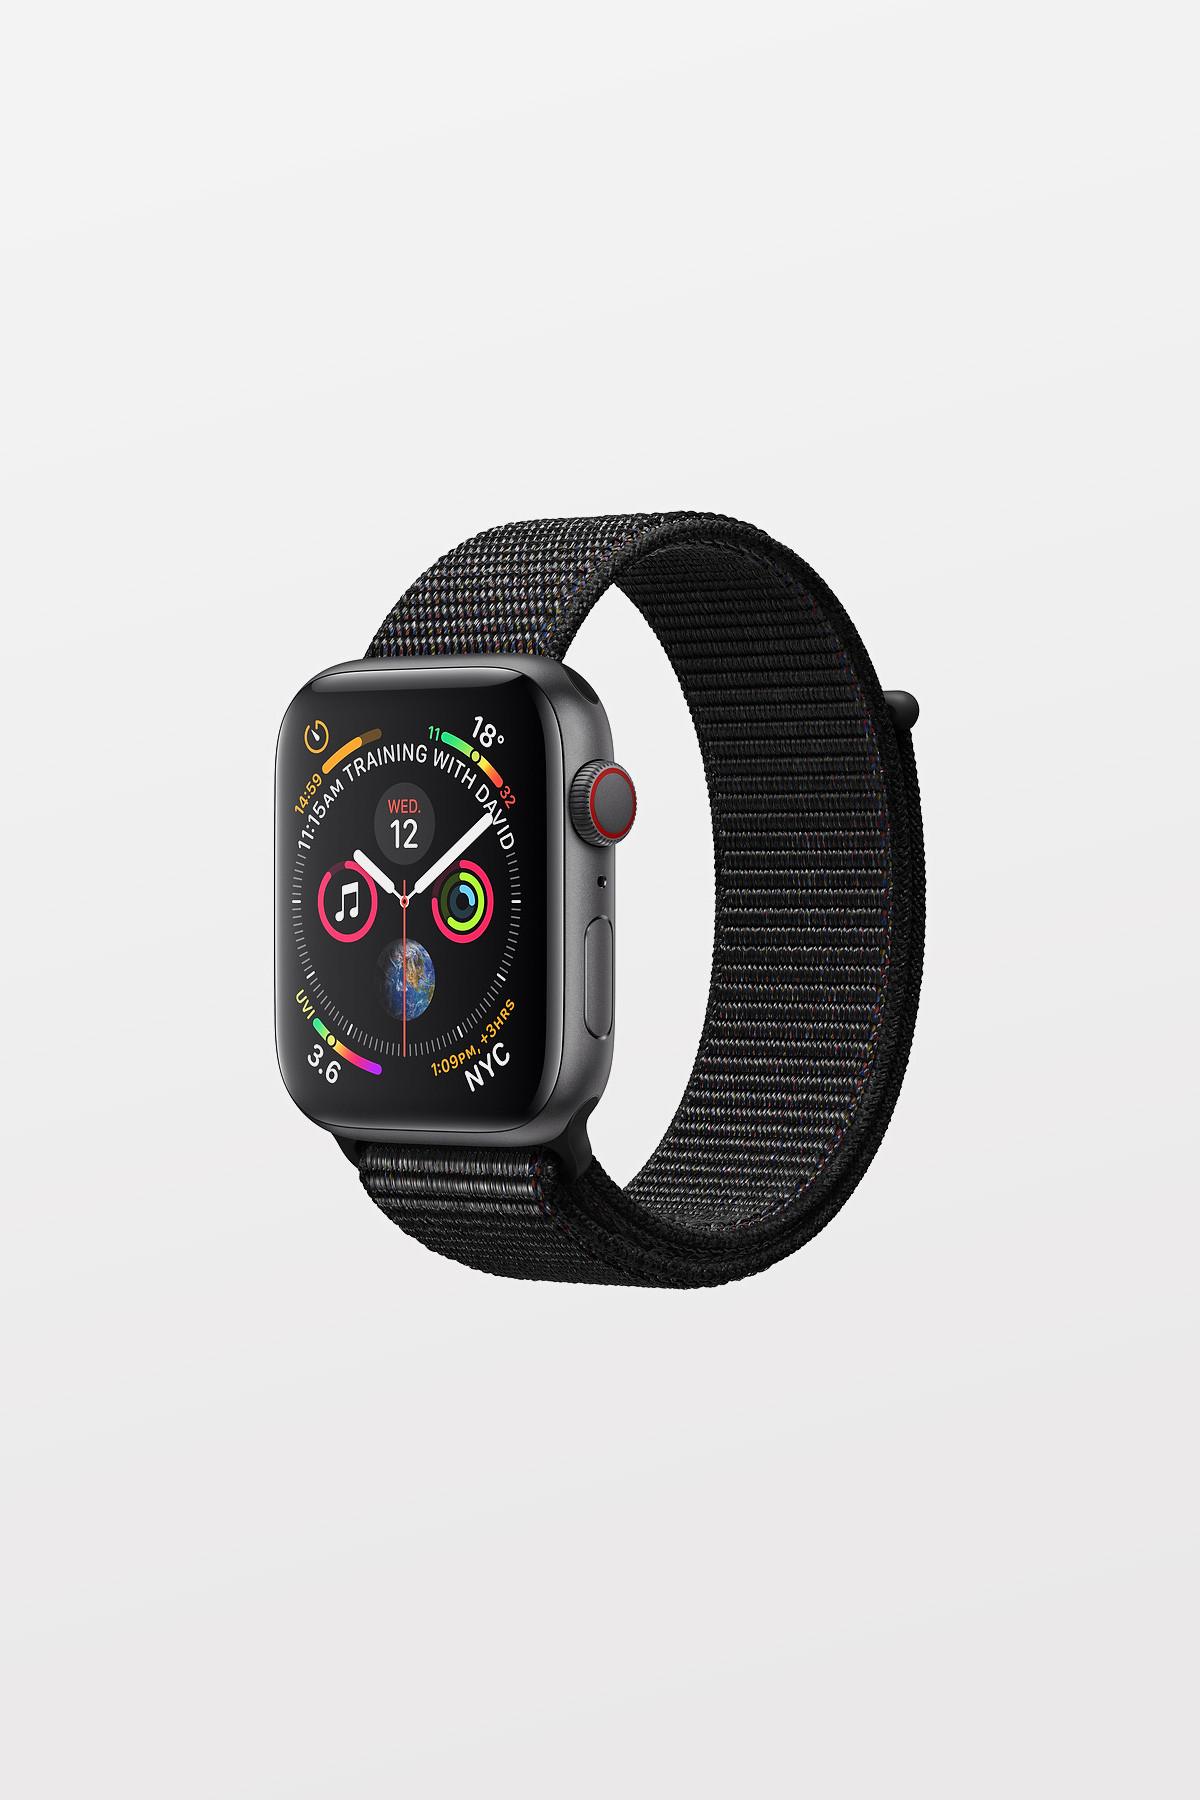 Apple Watch Series 4 Cellular - 44mm - Space Grey Aluminium Case with Black Sport Loop - Refurbished